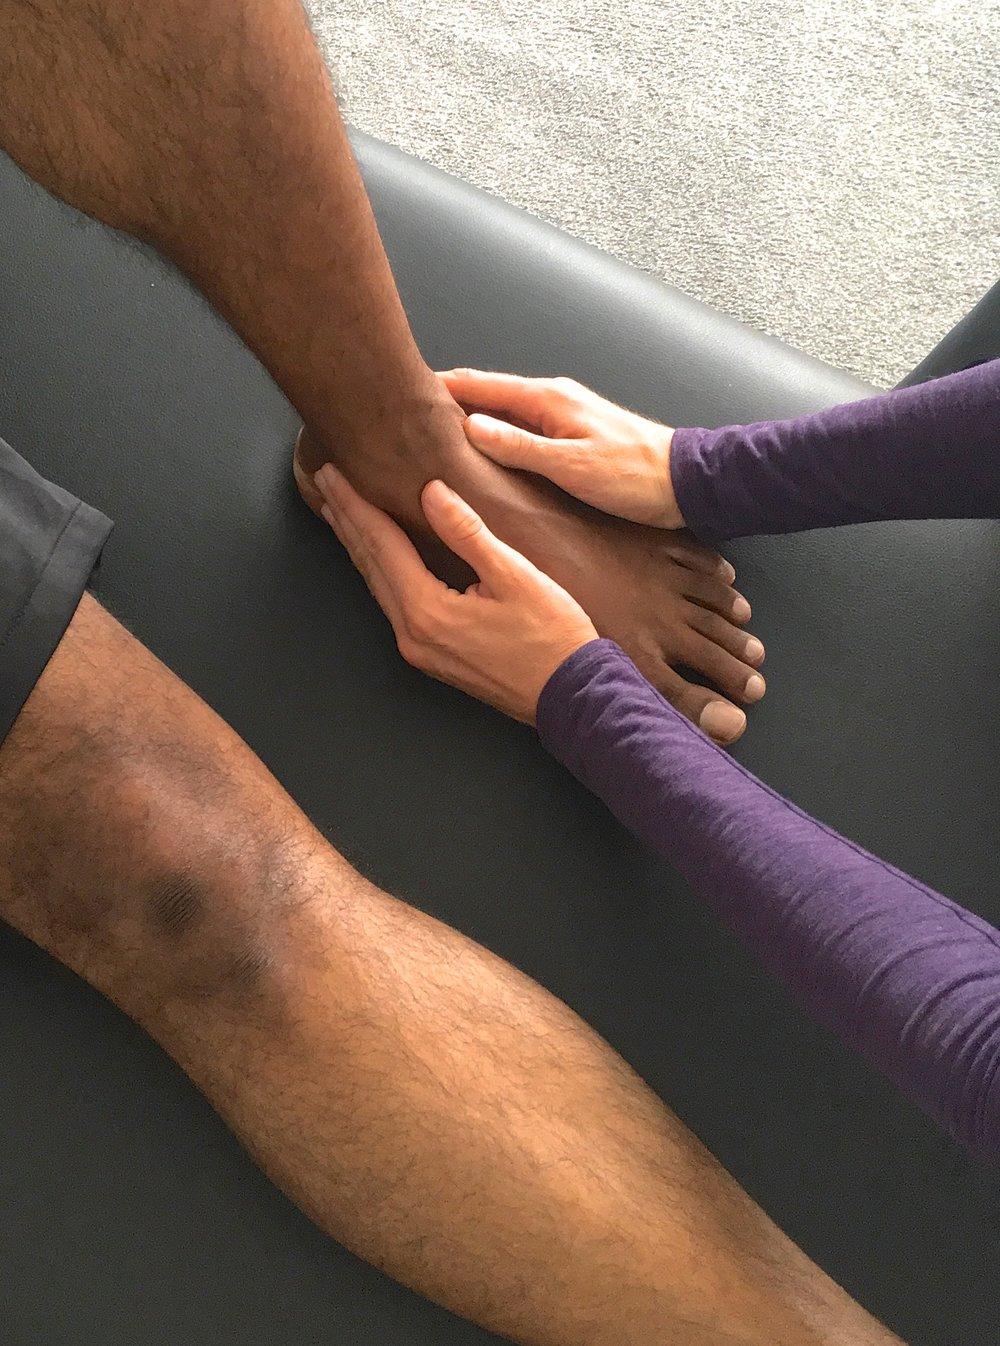 Examples of Addressable Concerns - •Muscle & Joint Pain•Pre-Surgery & Post-Surgery Limitations•Scar Tissue•Inflammation of an Area - Bursitis, Tendinitis, Arthritis, Osteoarthritis•Nerve Issues - Sciatica, Thoracic Outlet, Carpal Tunnel, Neuralgia, etc.•Spine - Bulging Discs, Low Back Pain, Scoliosis, etc.•Pelvis- Bladder Function, Scars , Birth Trauma, Pelvic Floor Issues, IVF, Tailbone, etc.•Upper Limb - Rotator Cuff, Frozen Shoulder, Tennis/Golfer's Elbow, etc.•Hip & Knee - IT Band Syndrome, Patellar Pain, Knee Imbalances, etc.•Lower Leg - Shin Splints, Plantar Fasciitis, Ankle Sprains, Bunion, etc.•Neck, Head & Face - TMJ Pain, Headaches, Neck Pain, Whiplash, Vertigo, Head Trauma, etc.•Prevention, Balance, Posture, Mobility, Restrictions, Limitations and more!